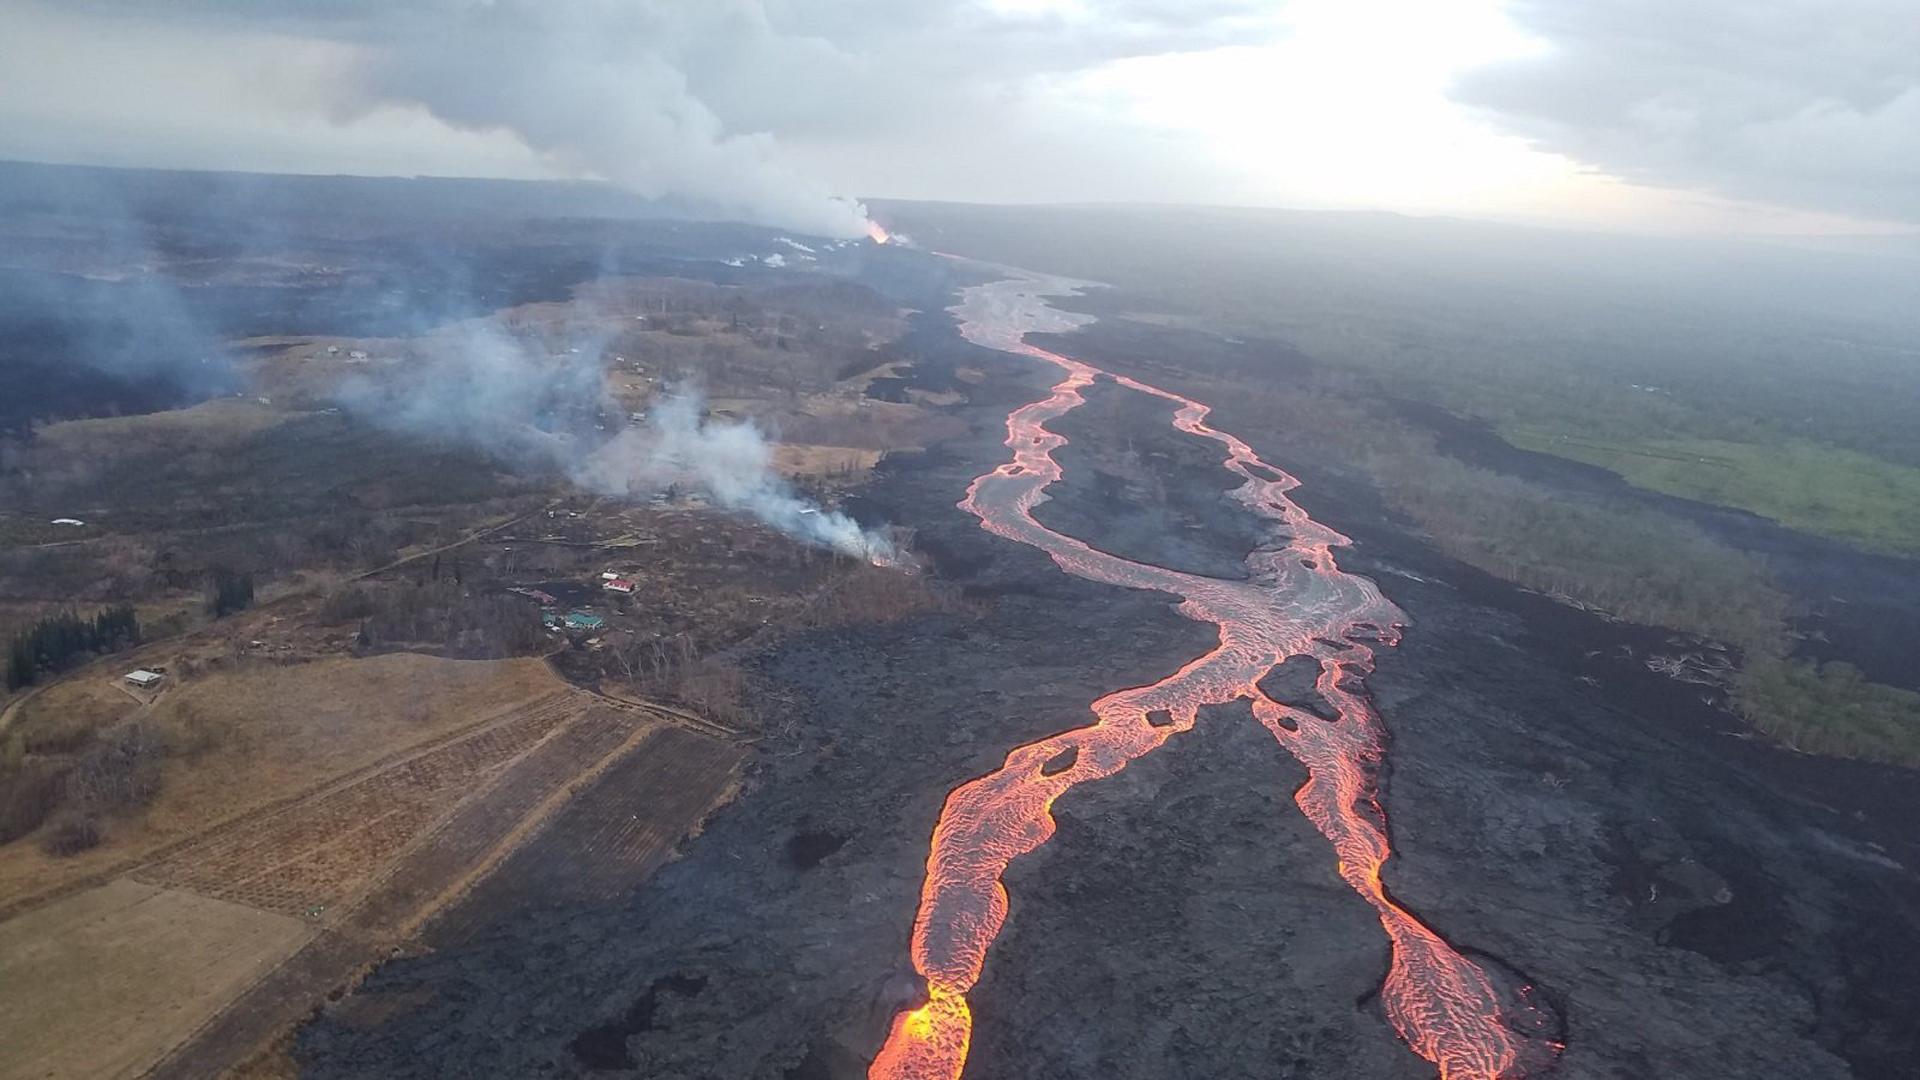 Lava flows toward the ocean in Hawaii. (Credit: USGS)